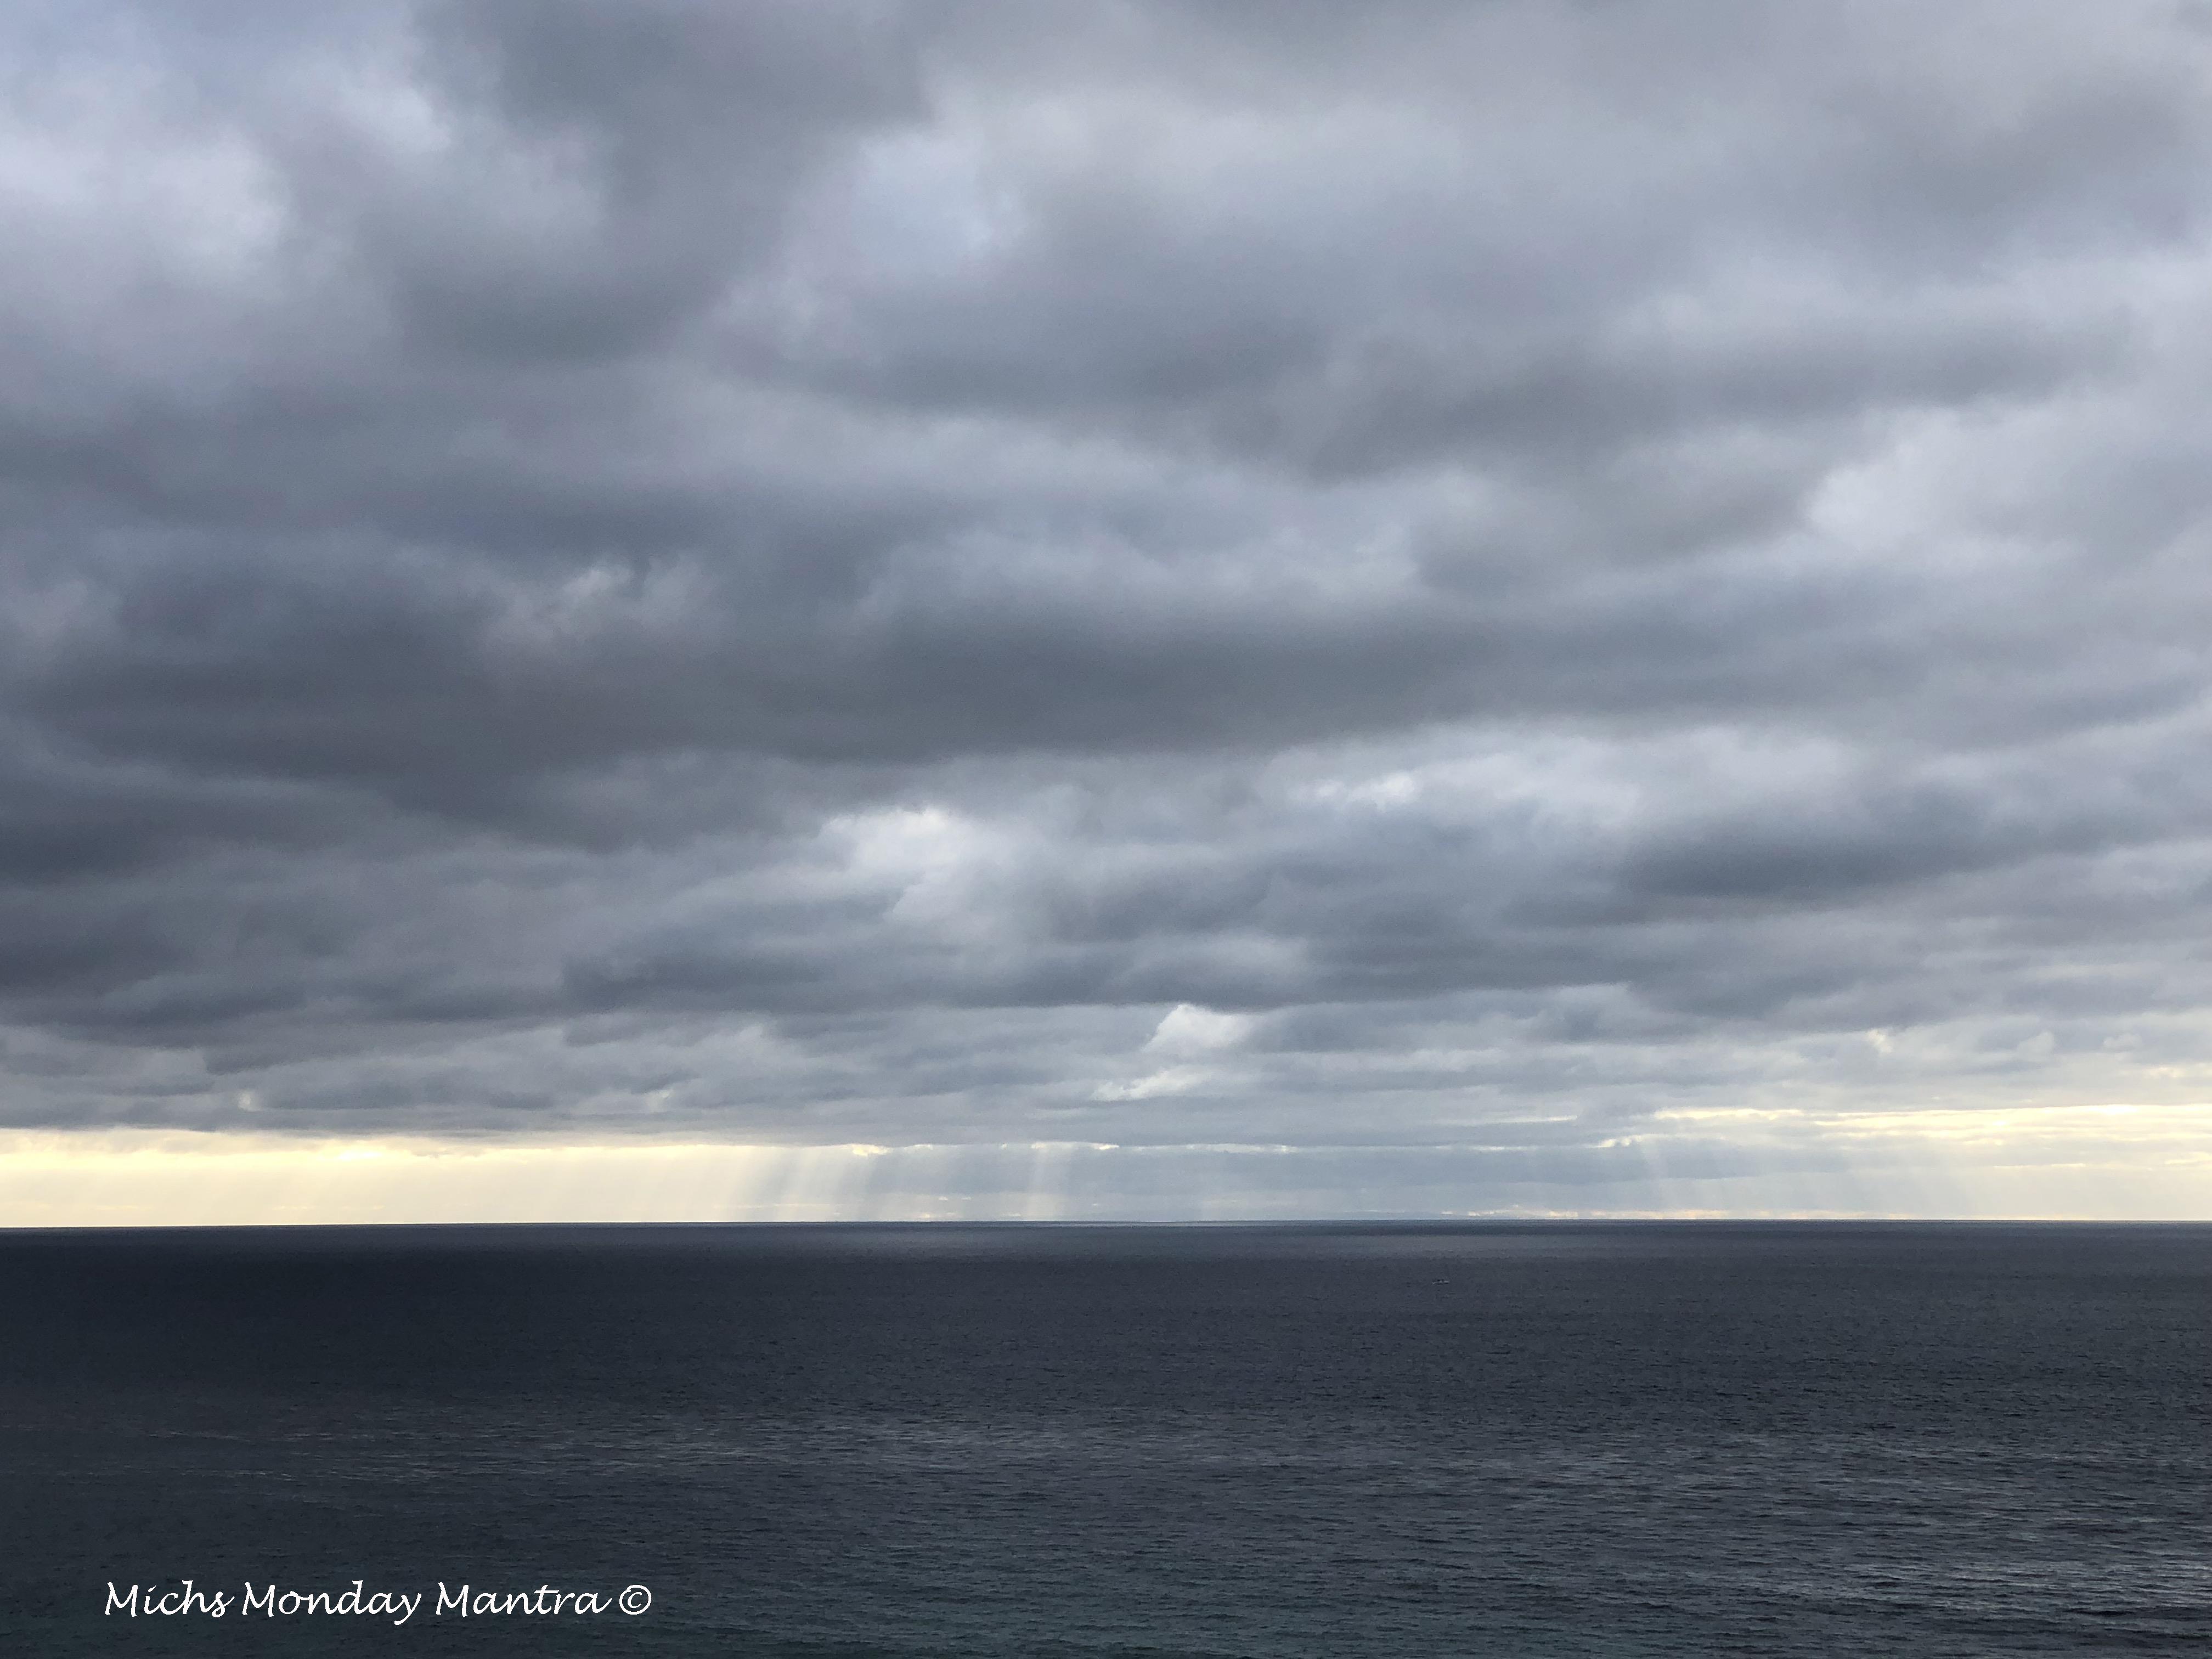 Mich's Monday Mantra- Amazing Grace